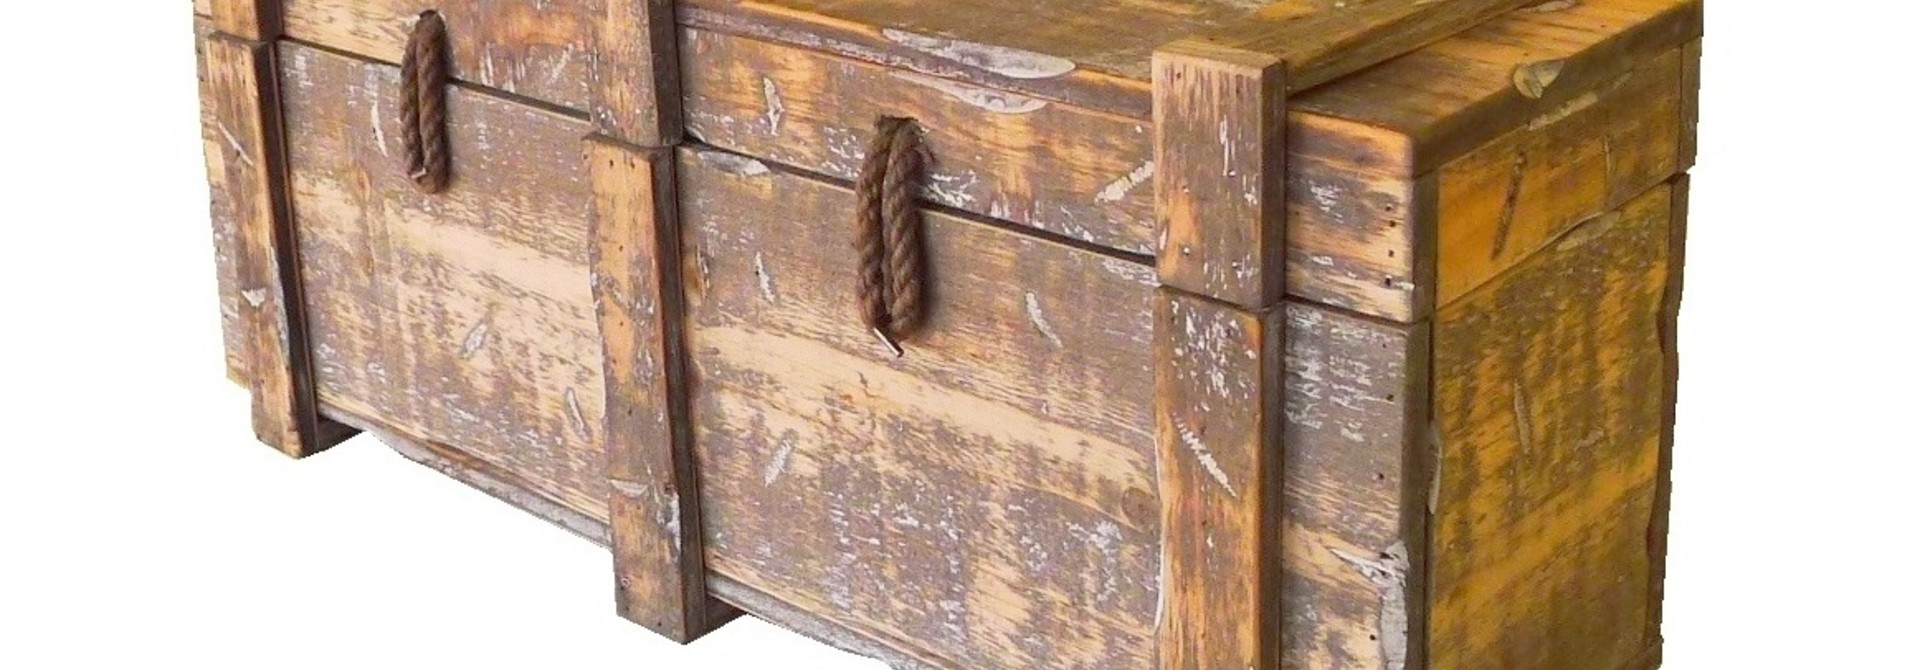 box old dutchtreas 58/19